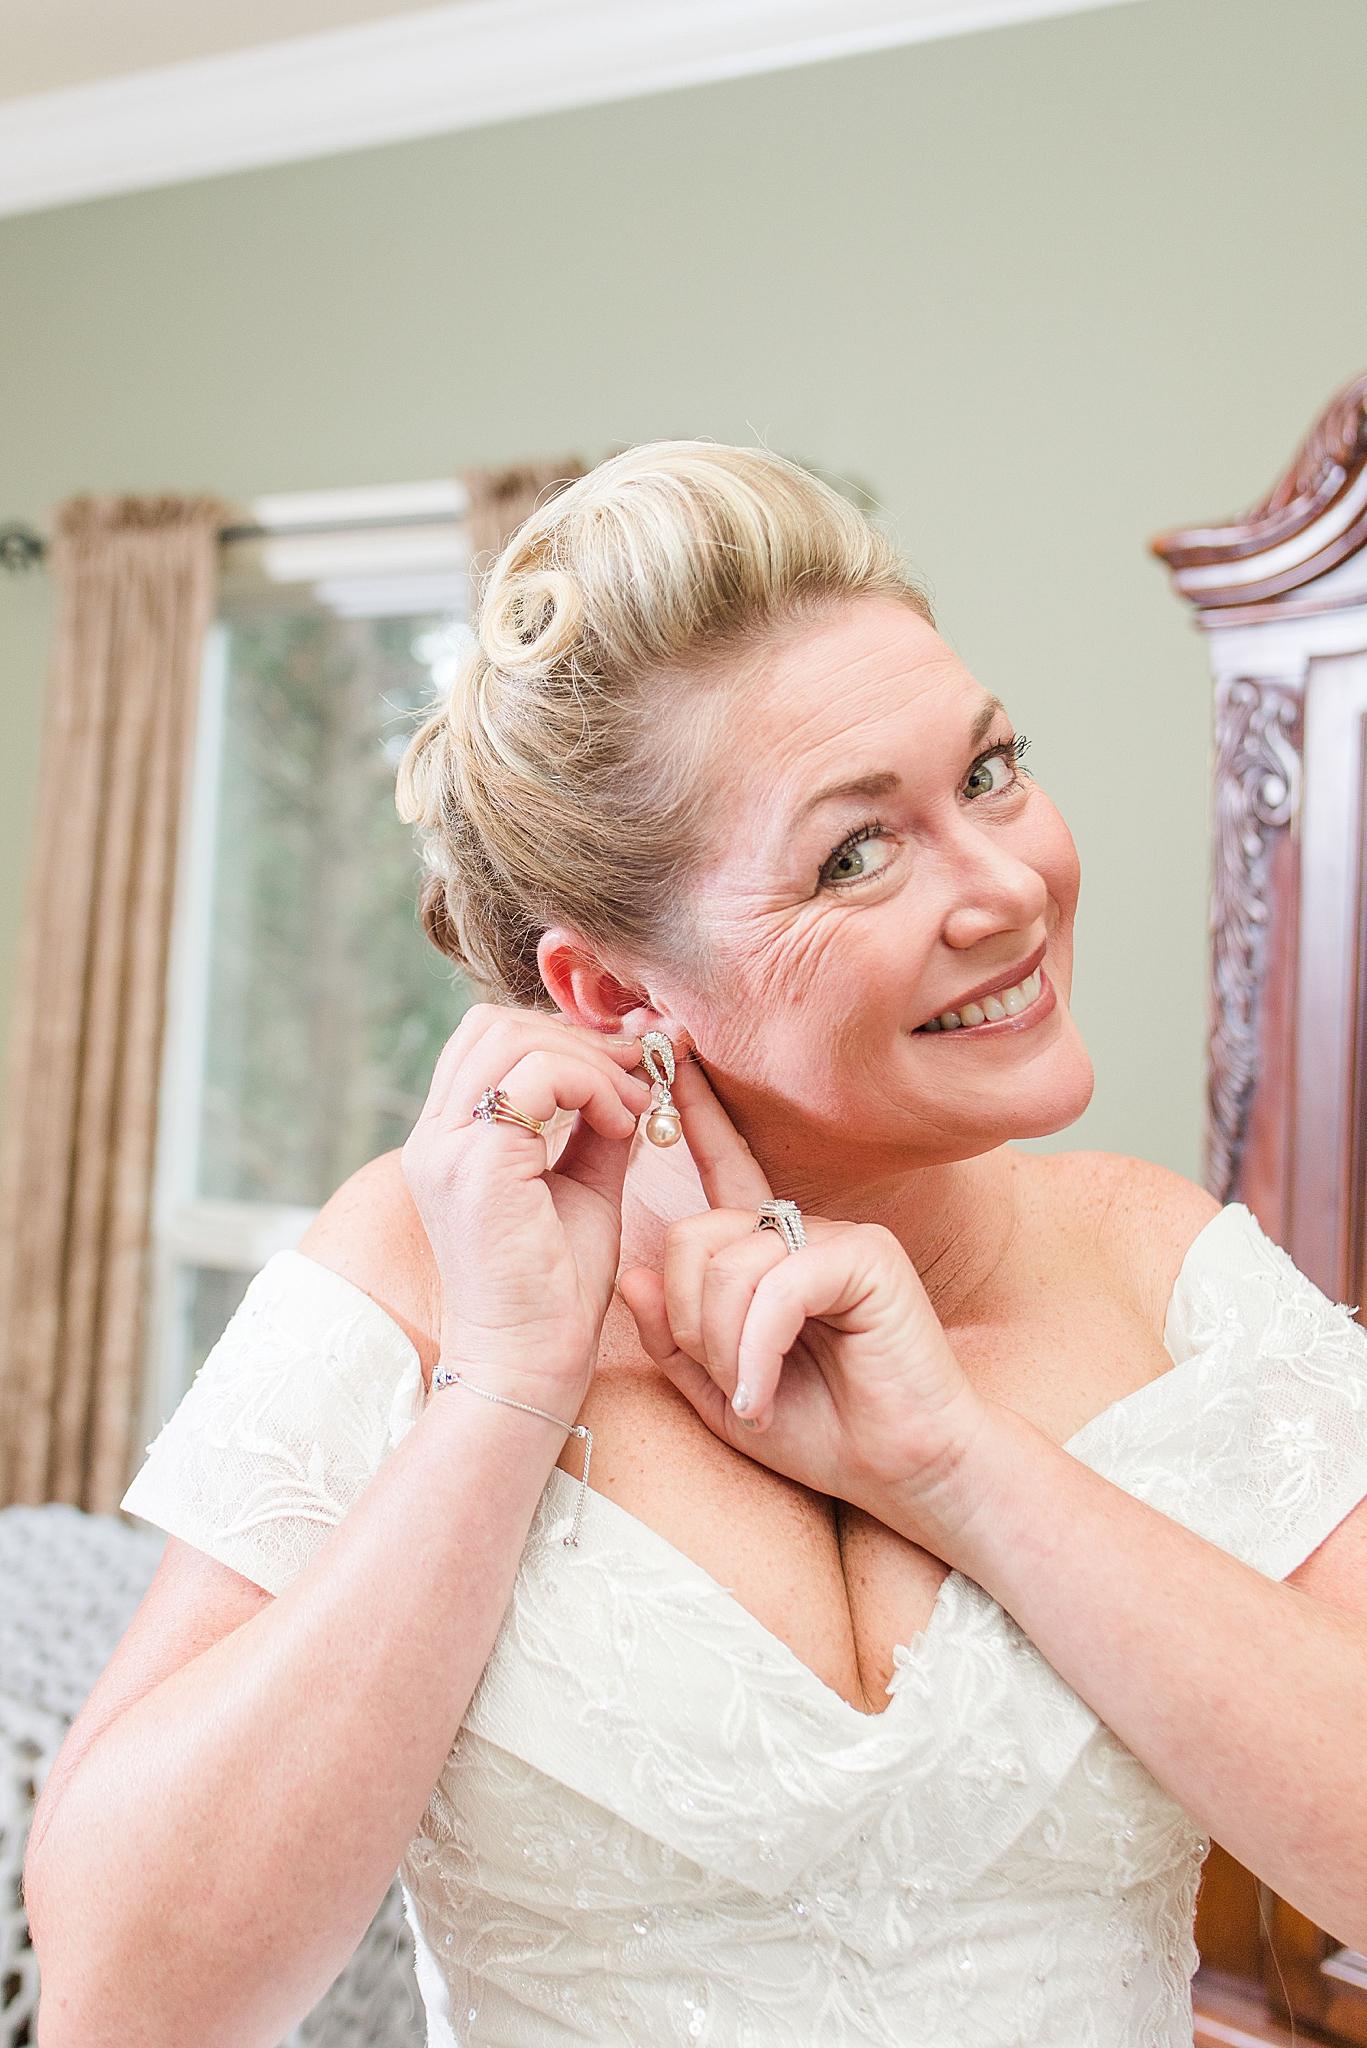 Alabama bride adjusts earrings before AL wedding